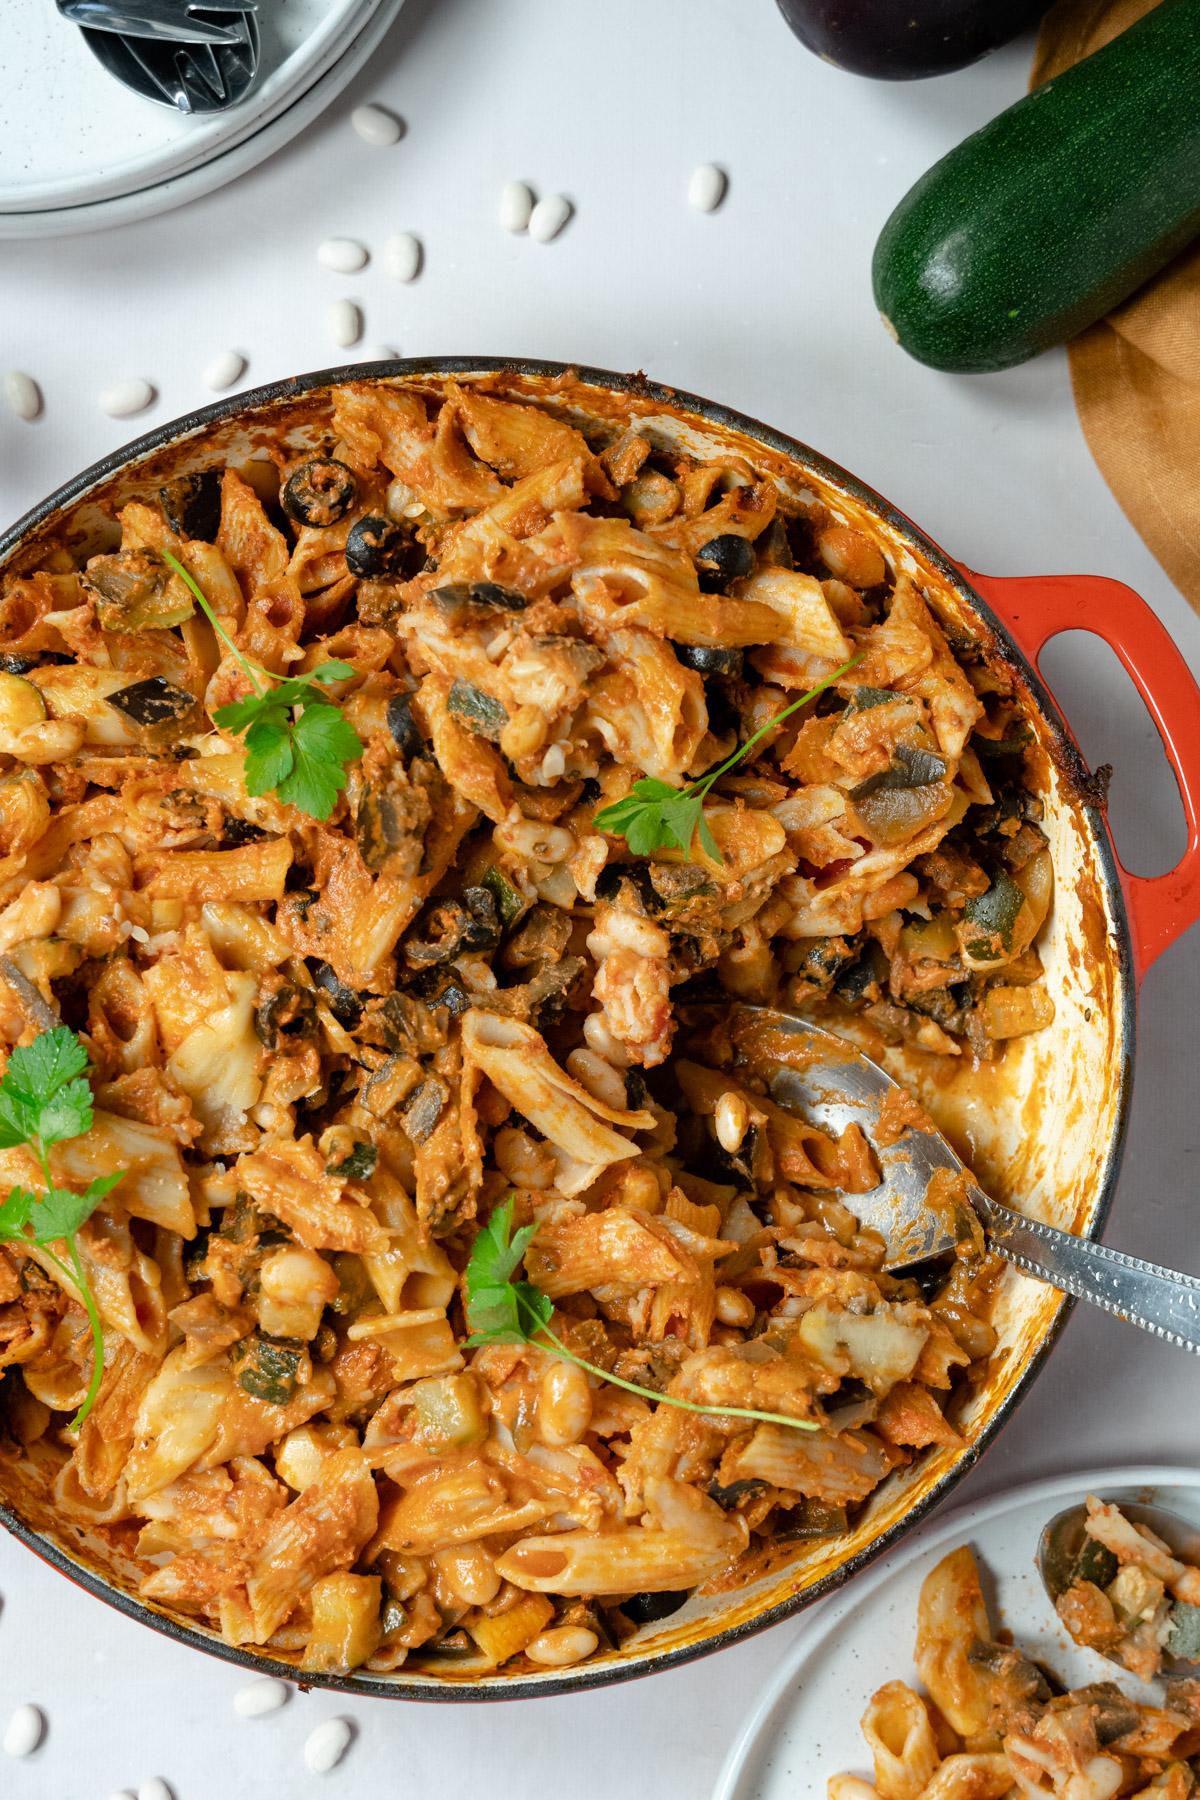 vegan pasta bake in a red casserole dish